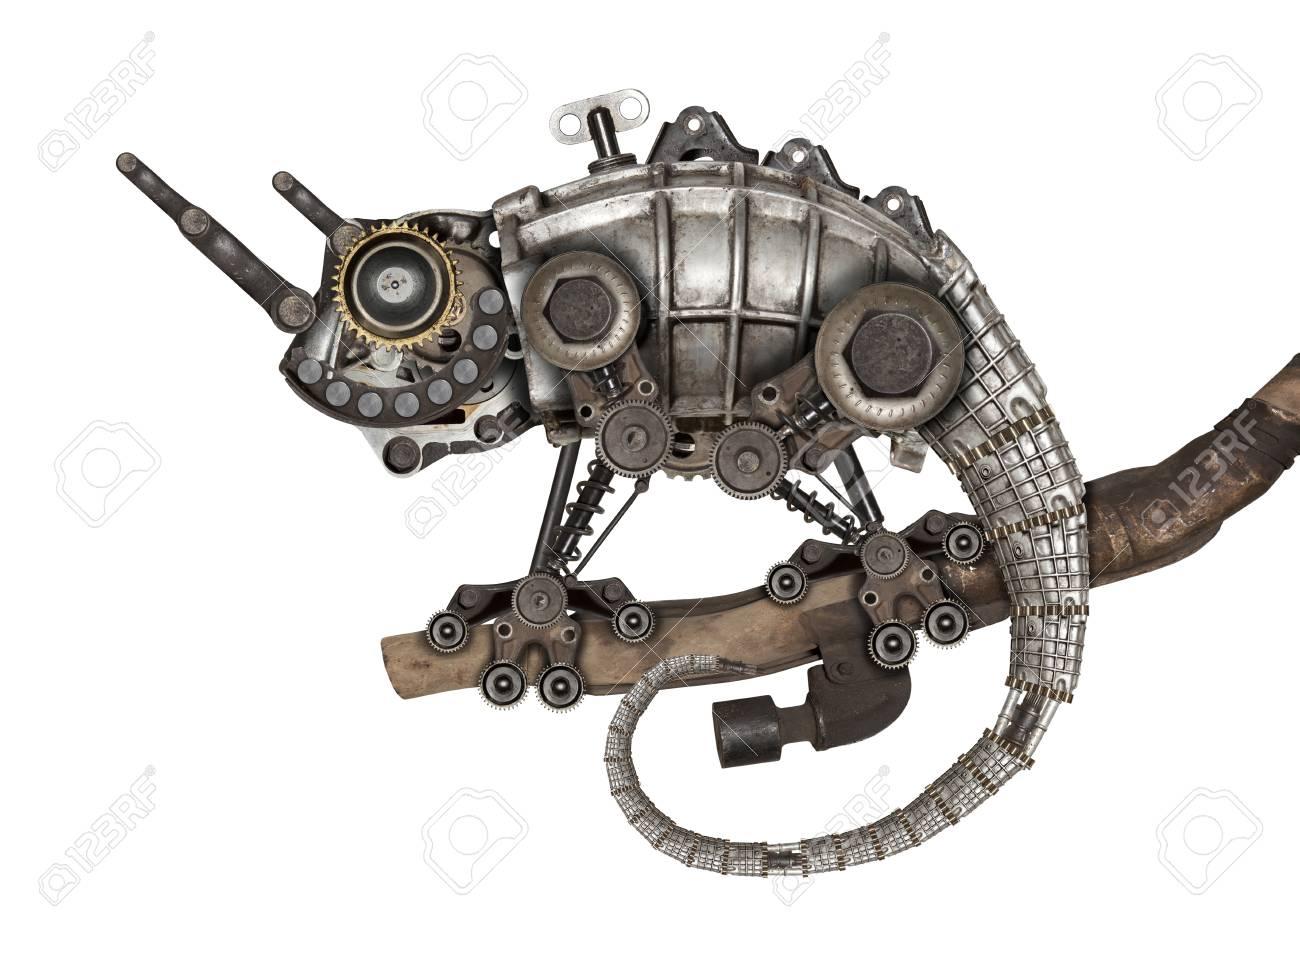 Steampunk style lizard. Mechanical animal photo compilation - 83568371